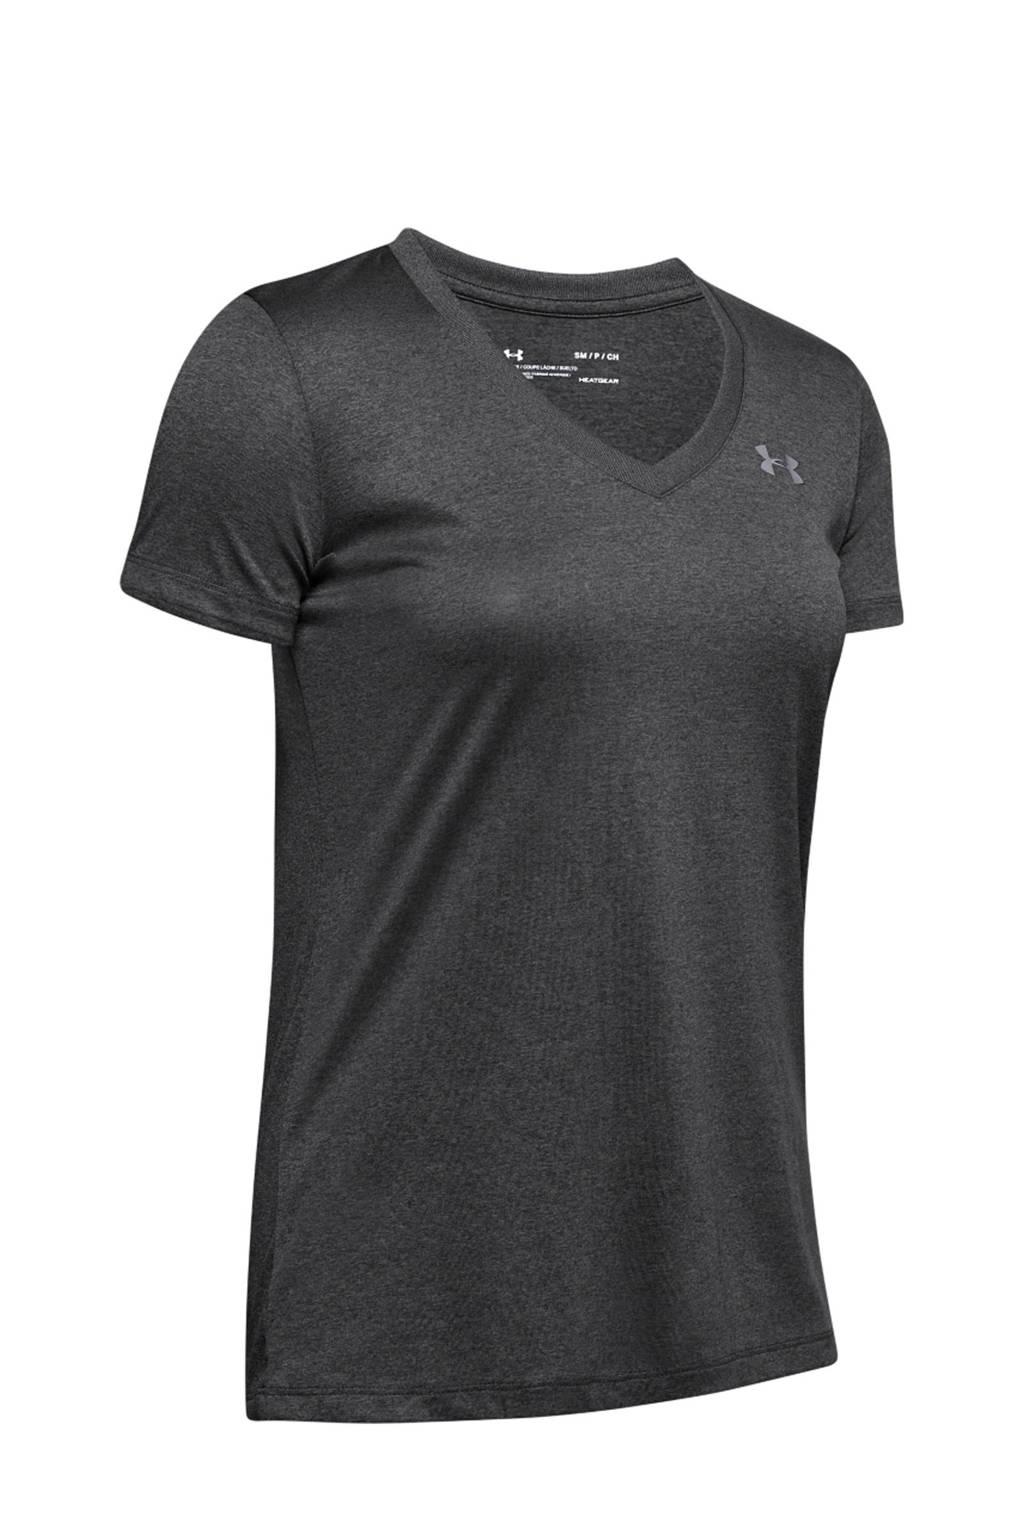 Under Armour sport T-shirt, Grijs melange/ grijs